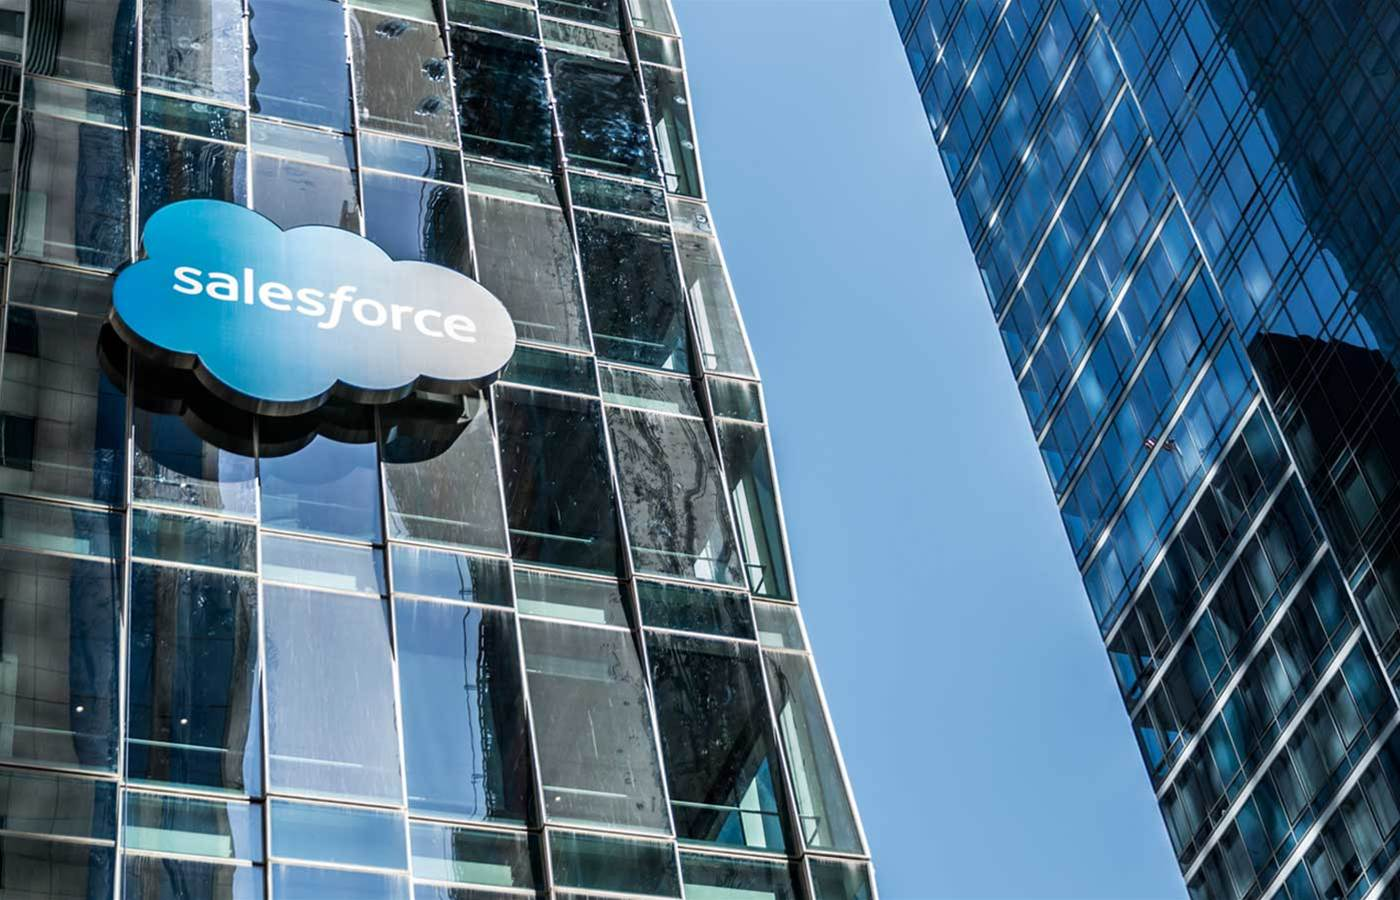 Salesforce in advanced talks to buy MuleSoft